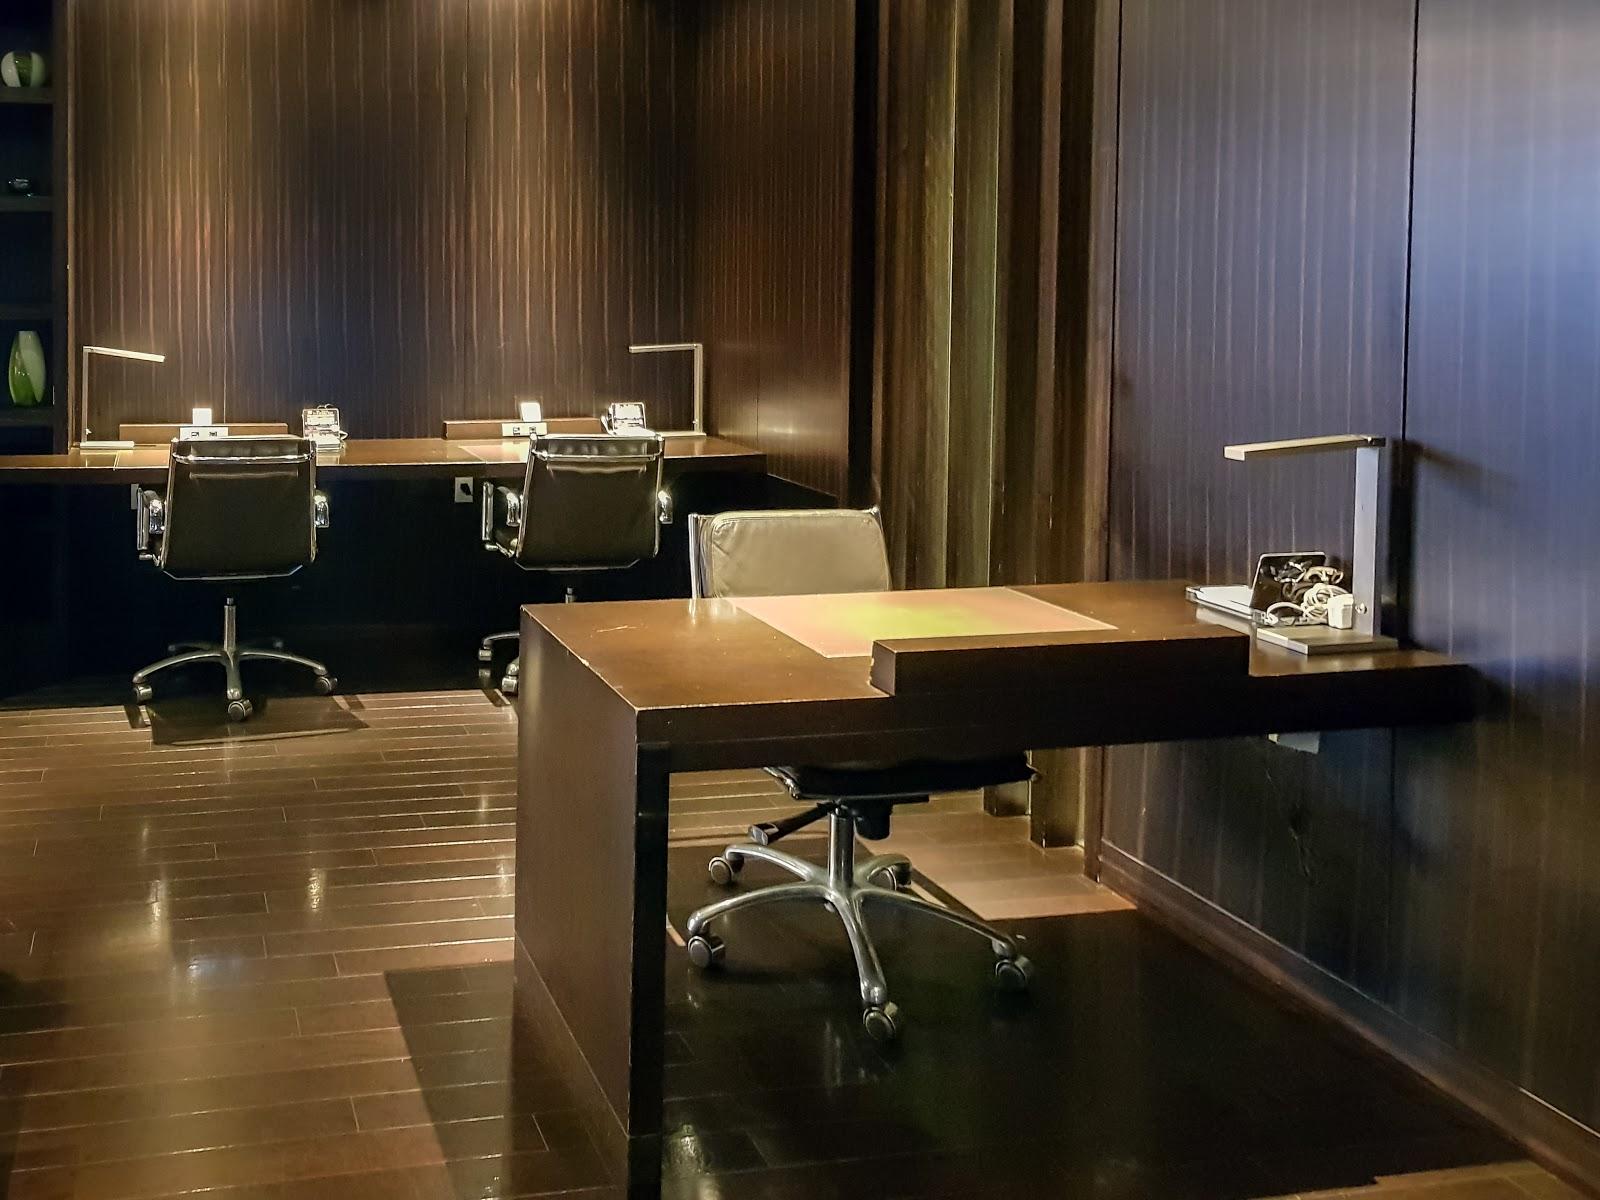 NRT|成田機場 日本航空頭等艙貴賓室 JAL First Class Lounge NRT